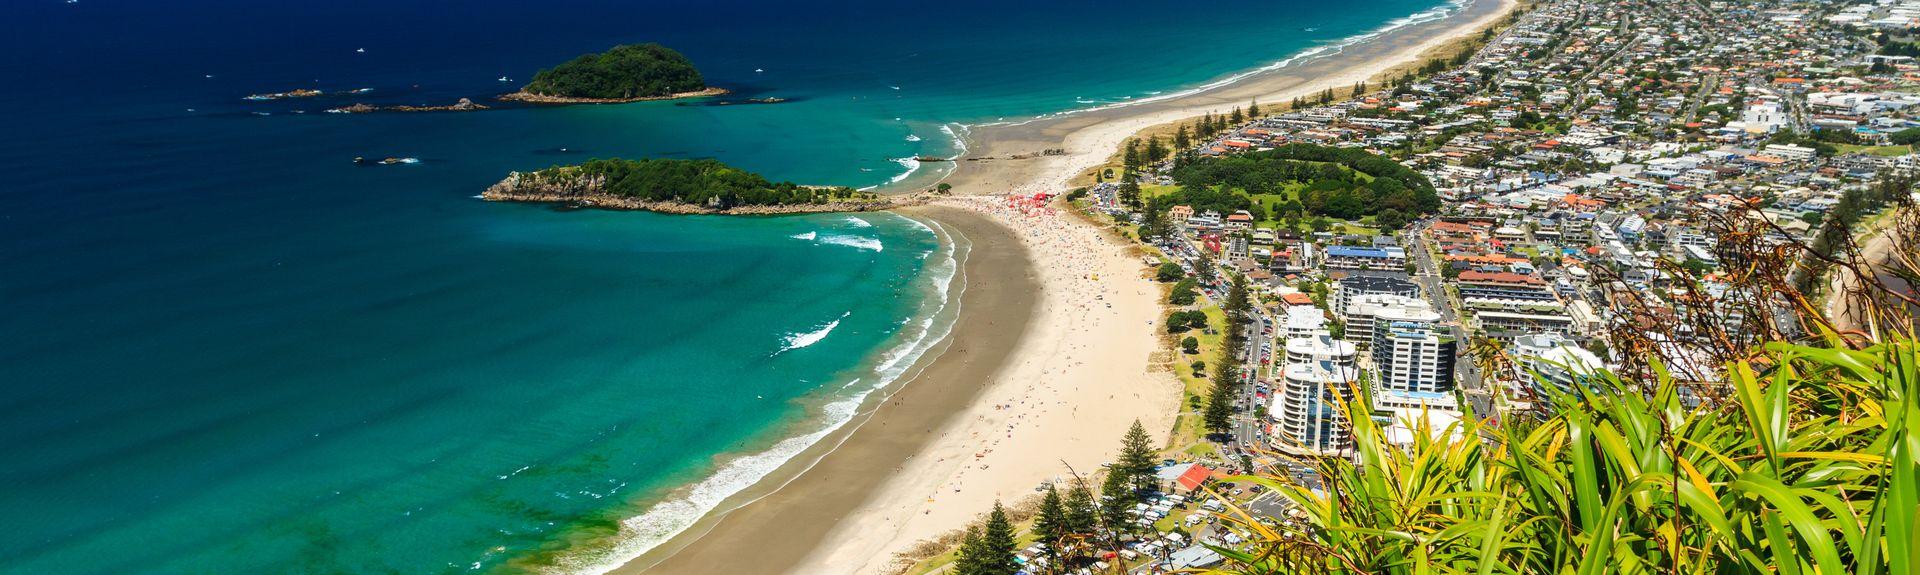 Tauranga, Bay of Plenty Region, New Zealand